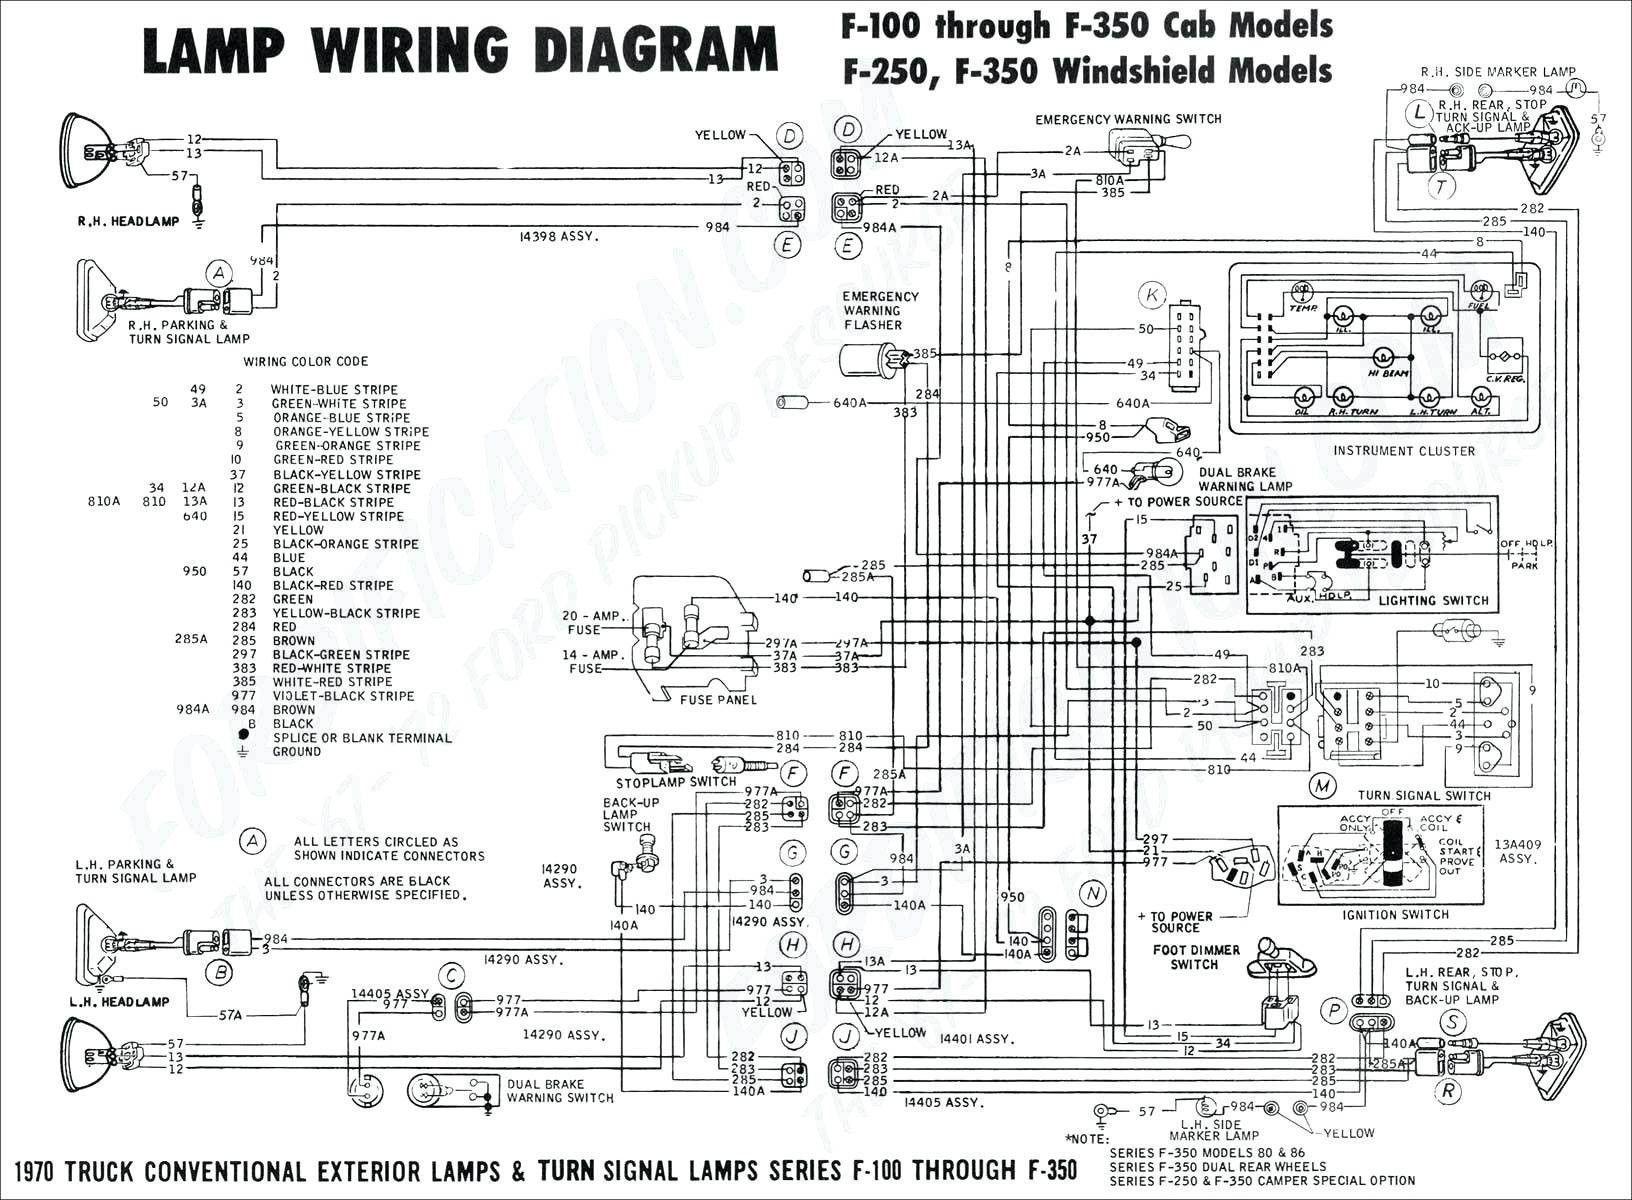 Unique Wiring Diagram For Auto Transformers Diagramsample